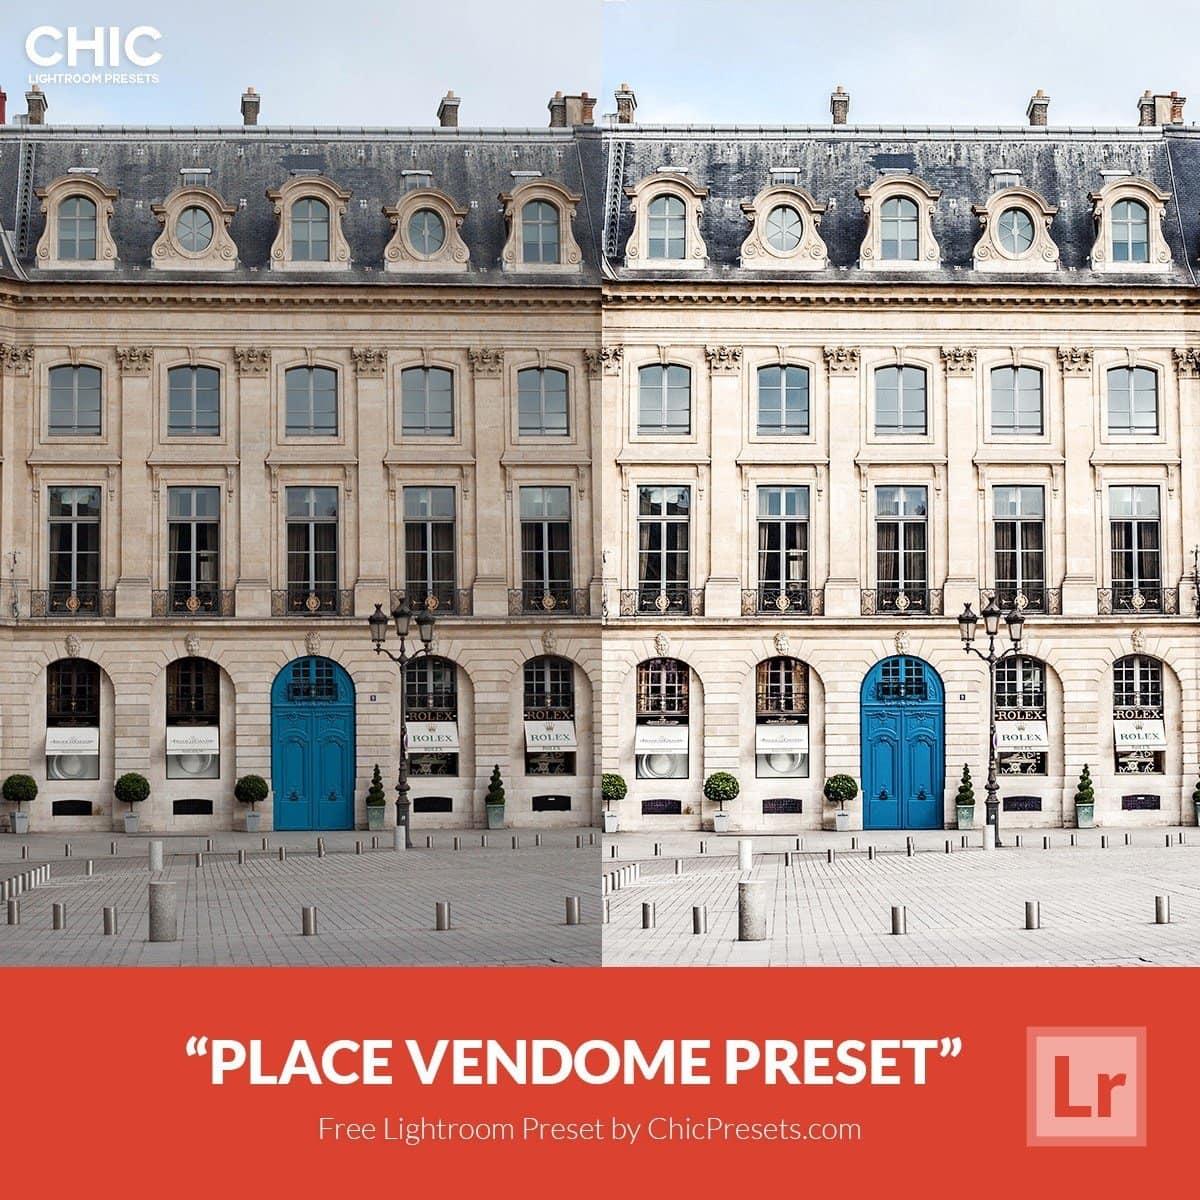 Free-Lightroom-Preset-Place-Vendome